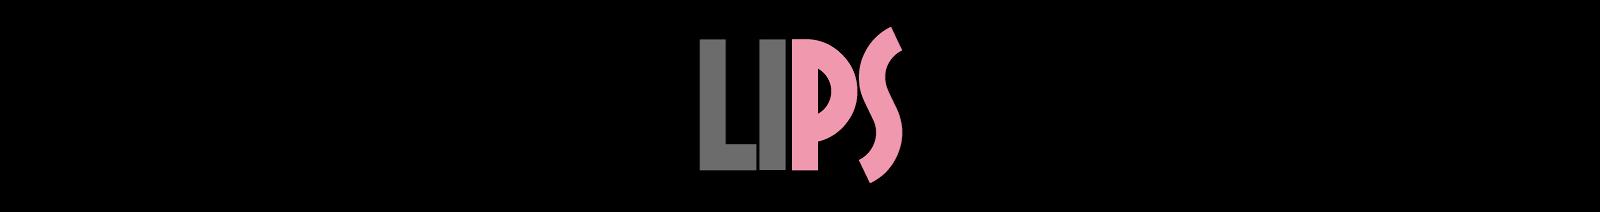 Lips Title